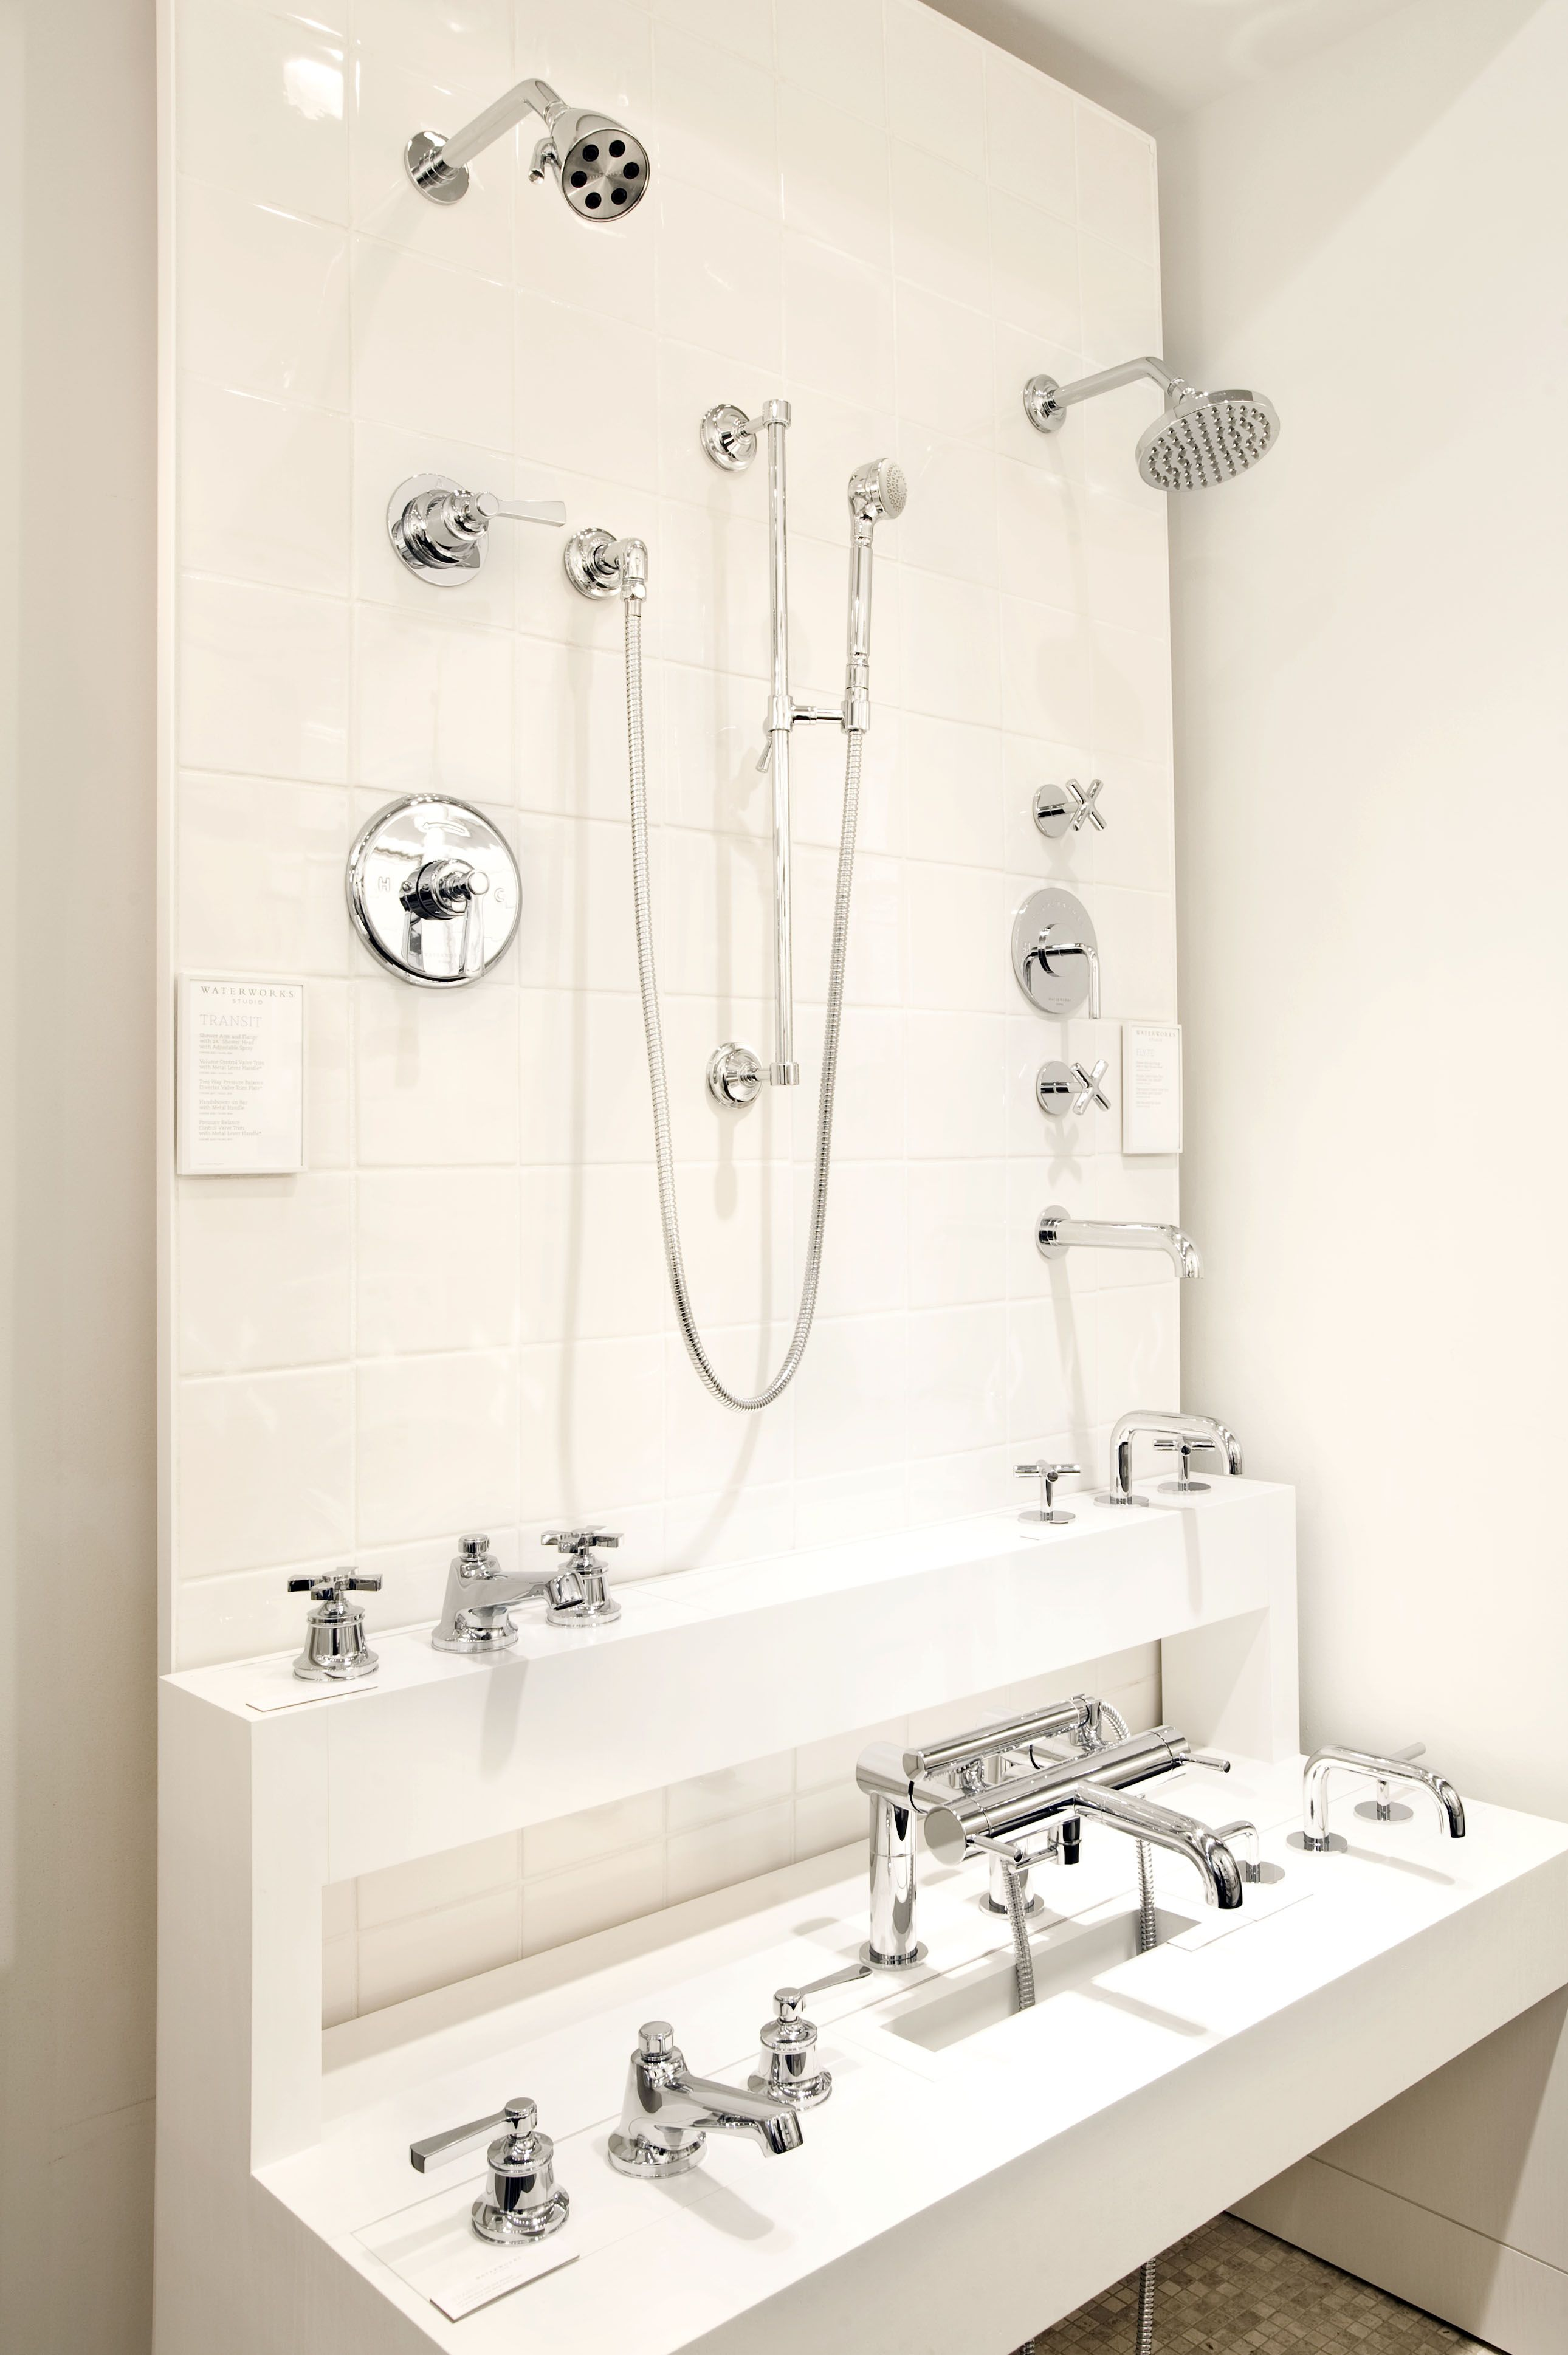 Fittings In The Denver Showroom Eclectic Bathroom Design